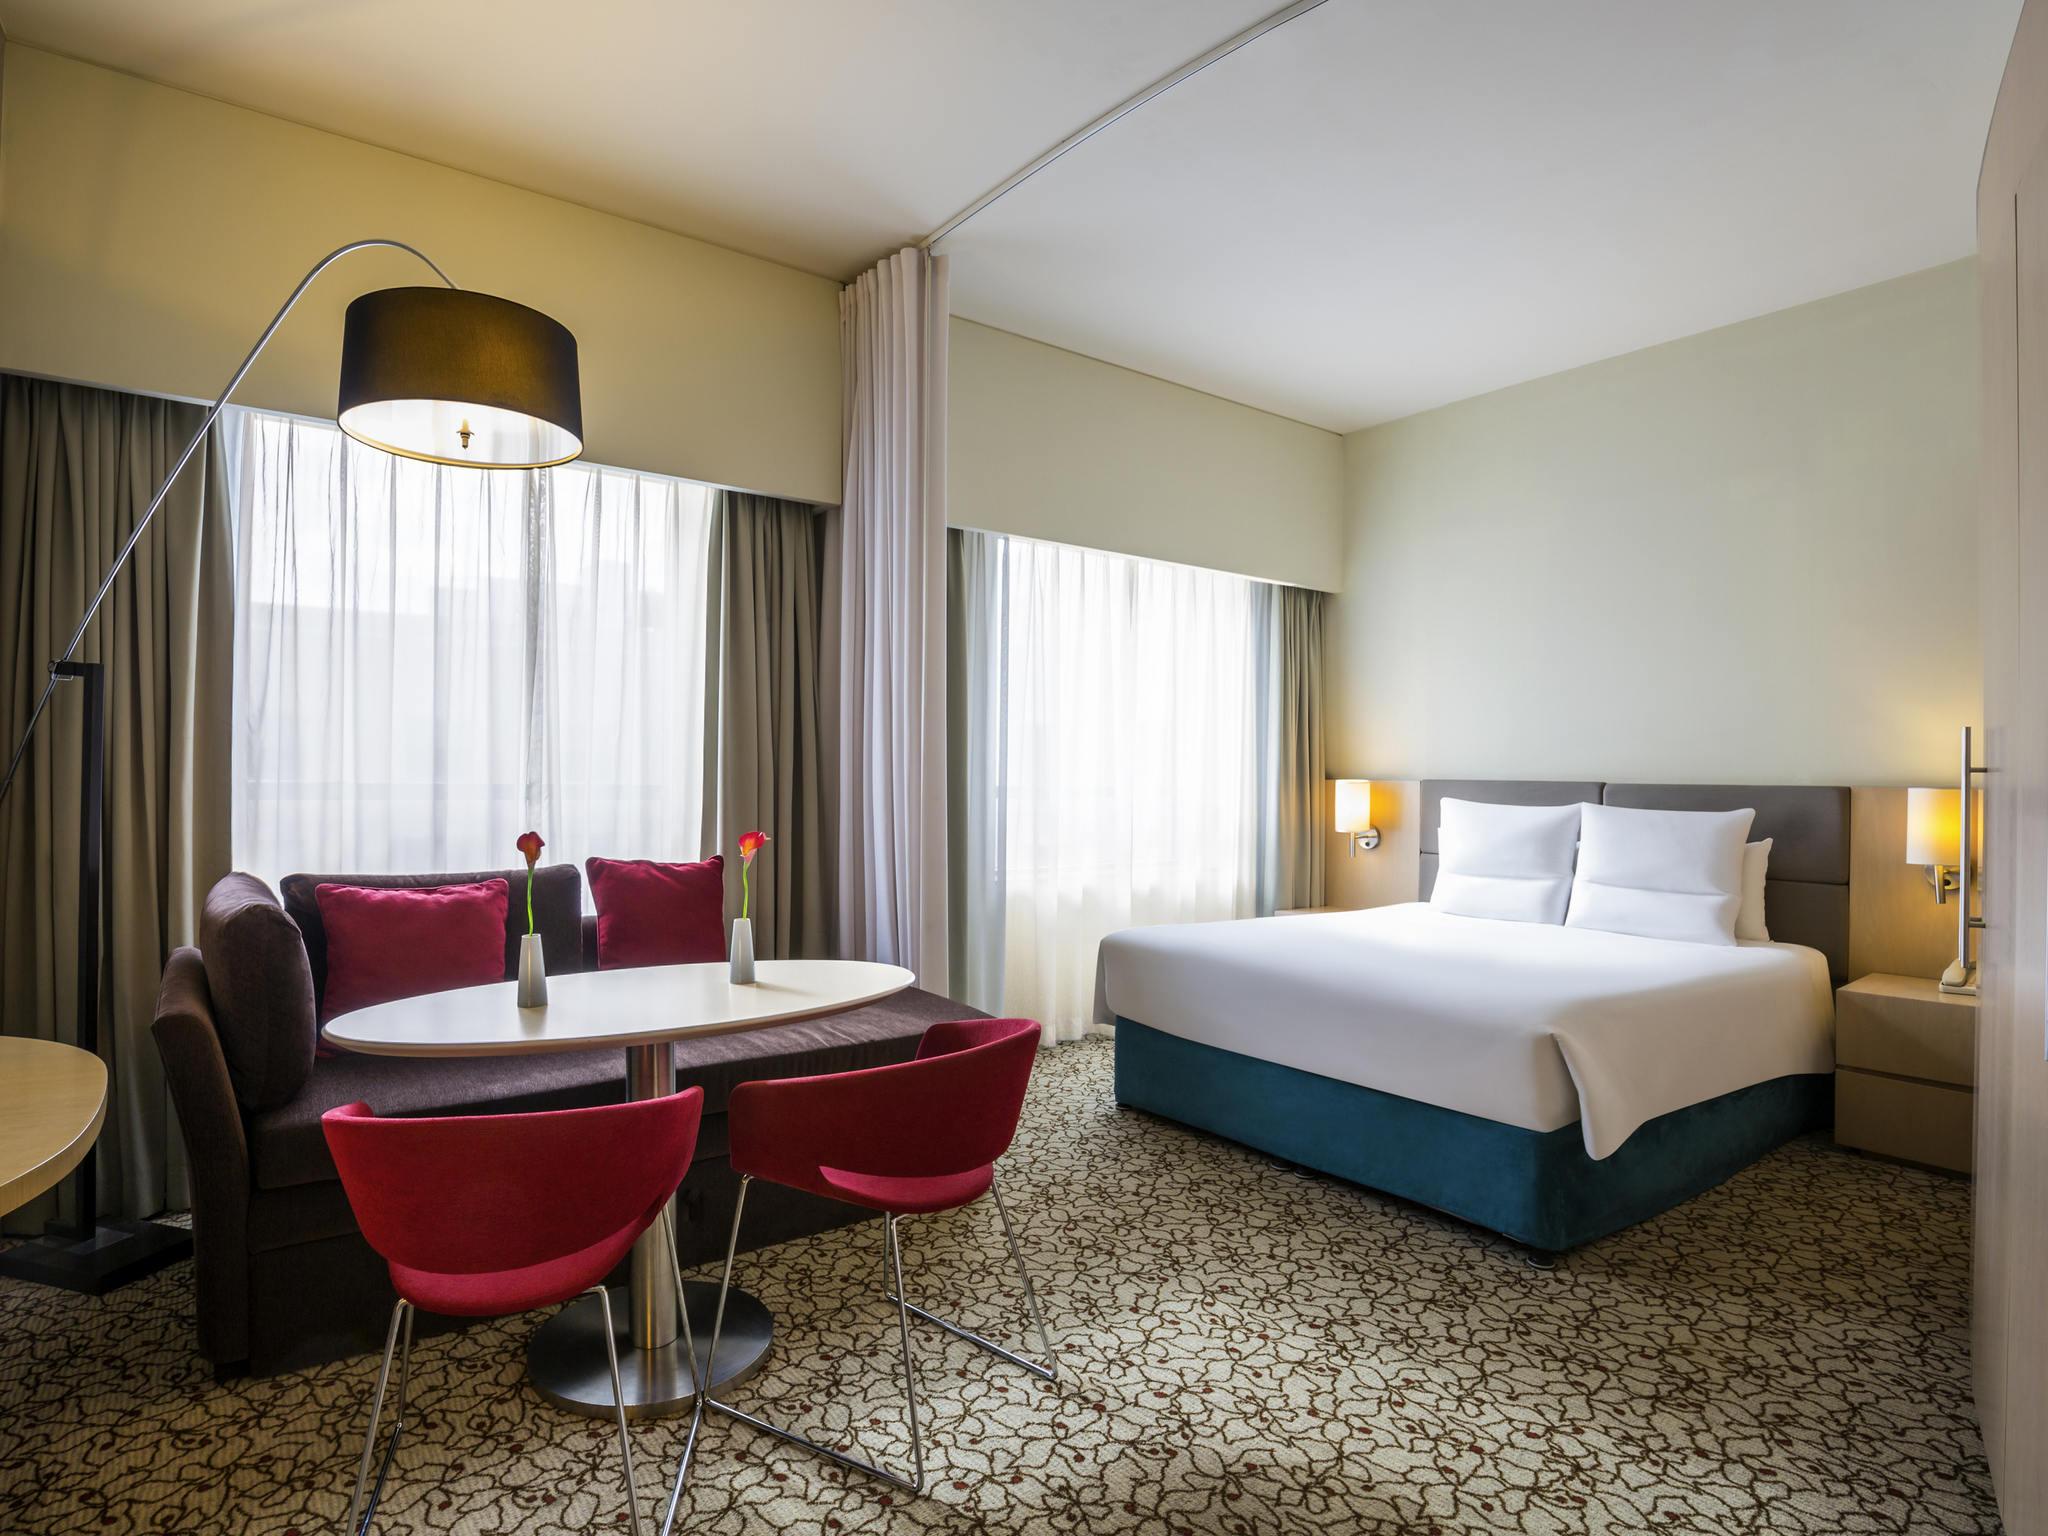 Hotel in dubai novotel suites dubai mall of the emirates rooms novotel suites dubai mall of the emirates reheart Gallery